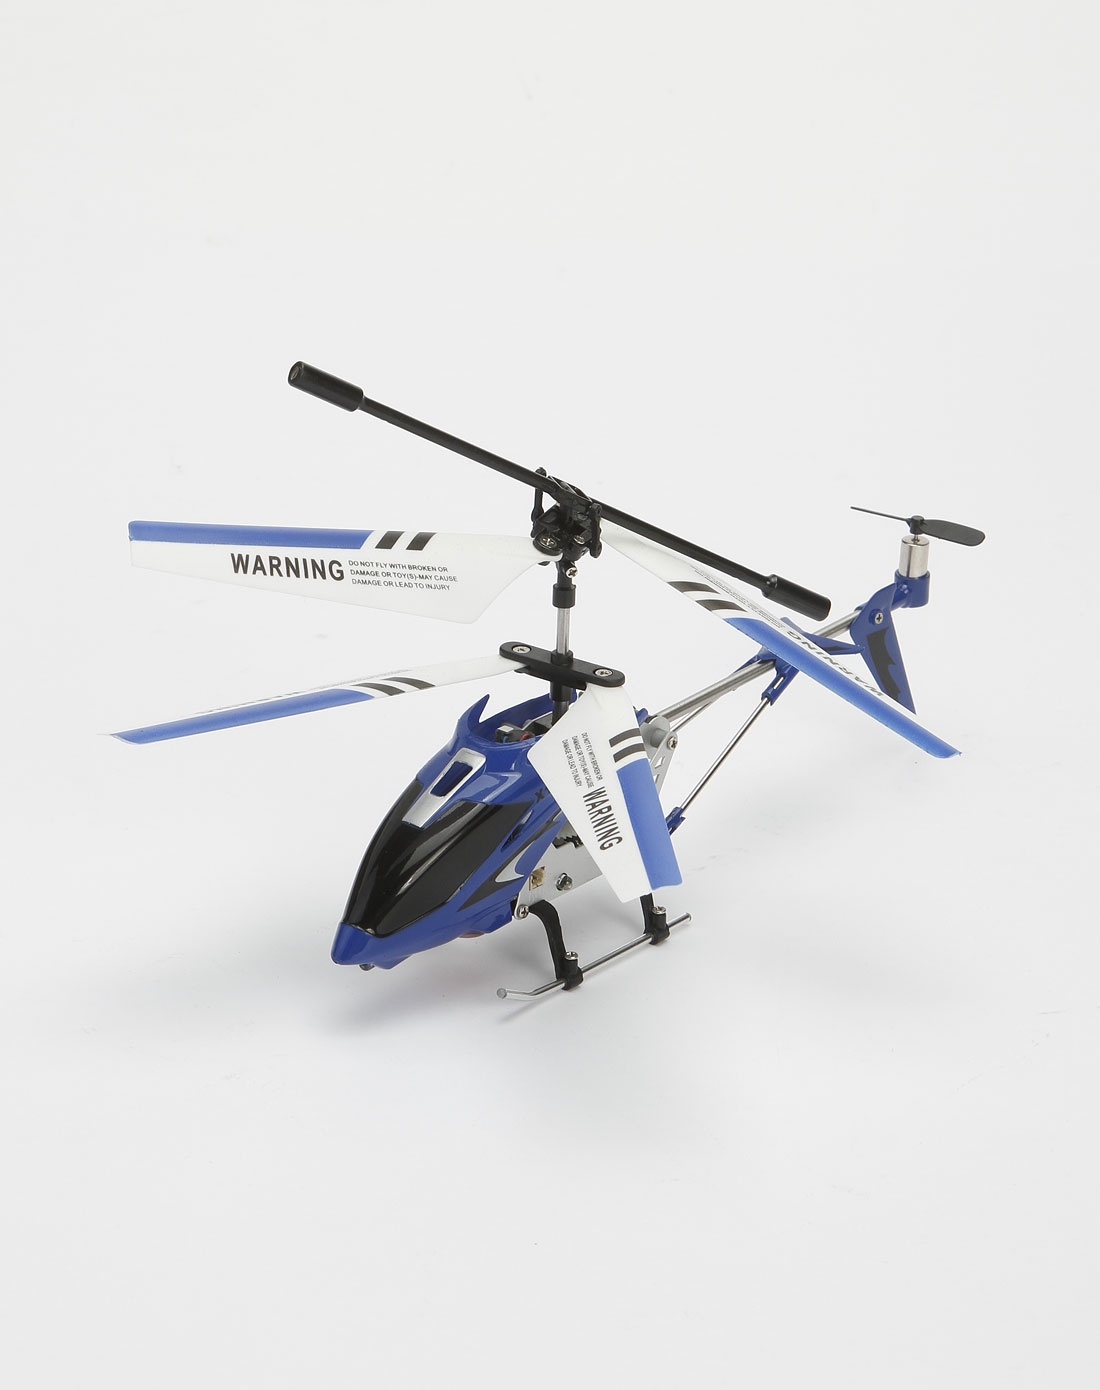 akai玩具专场-iphone遥控直升飞机蓝色